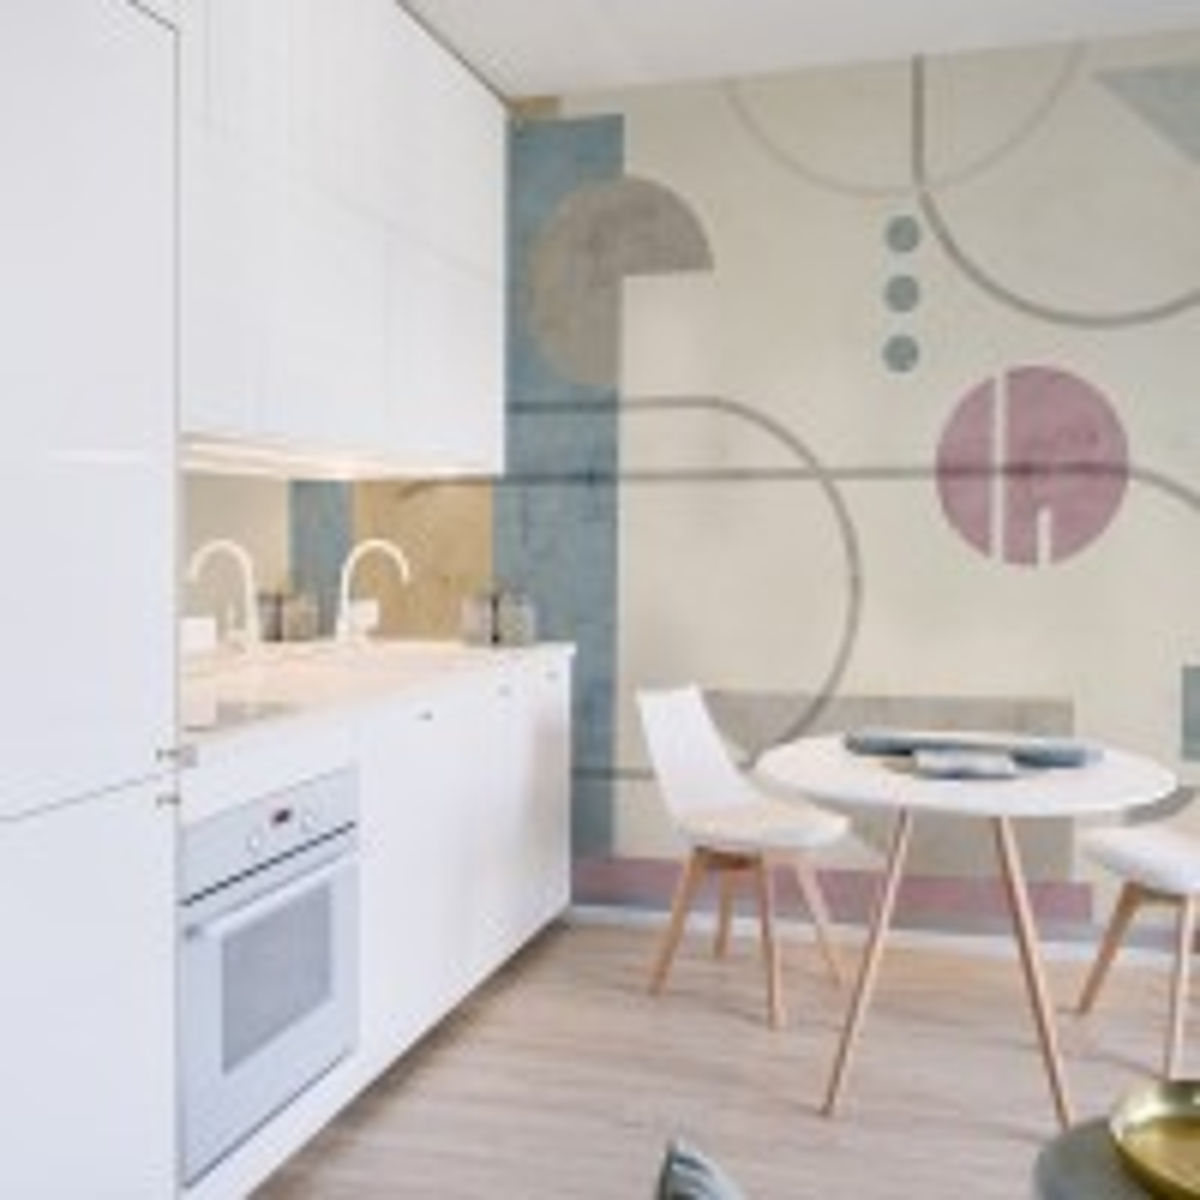 Soft Geometric Shape Art Wallpaper Mural